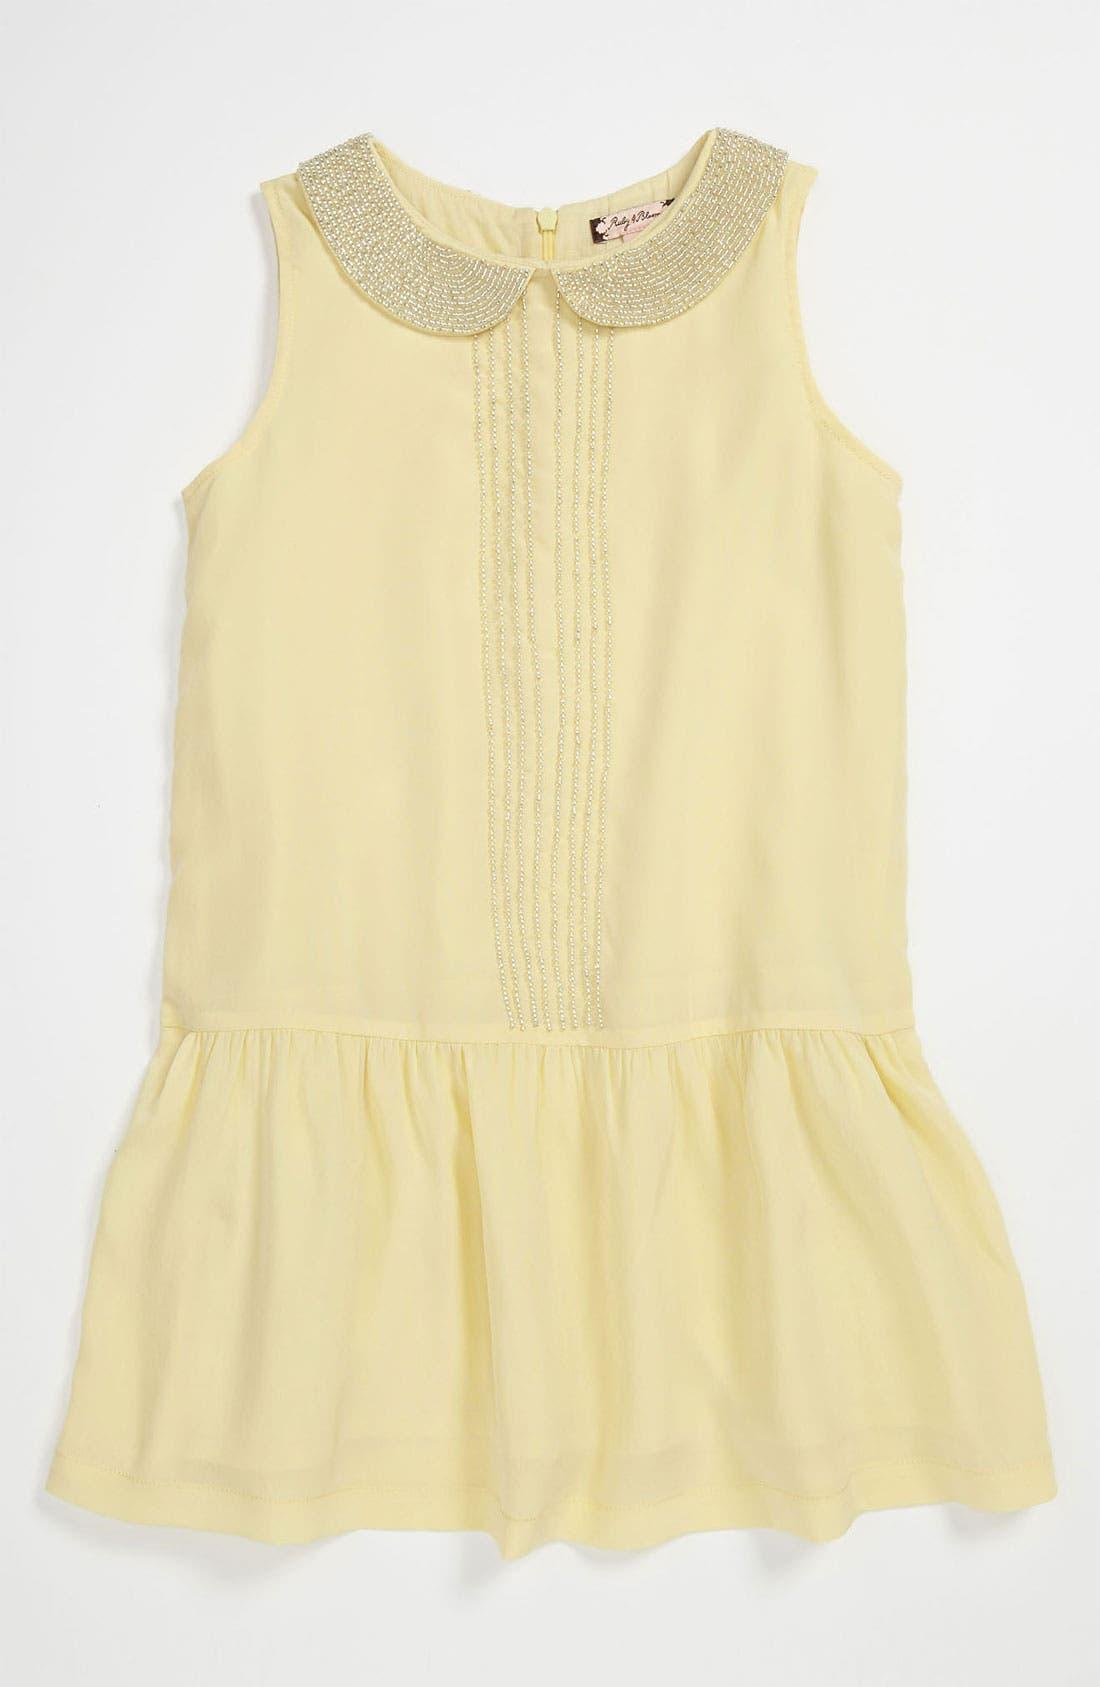 Main Image - Ruby & Bloom 'Harlow' Dress (Little Girls & Big Girls)